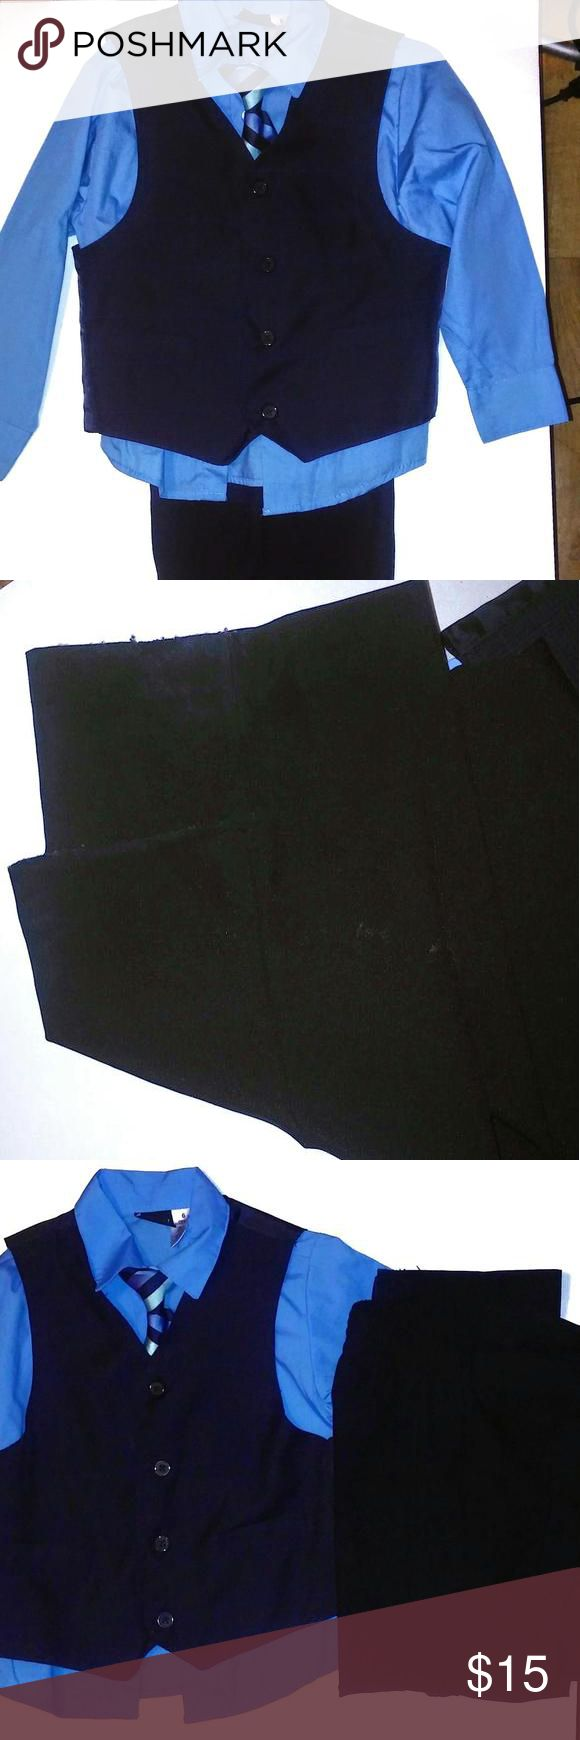 🎉Editor's Pick🎉💙4 Piece Navy Blue boys suit💙 Navy Blue. baby blue shirt. slacks have a few spots near bottom of slacks Boutique Matching Sets